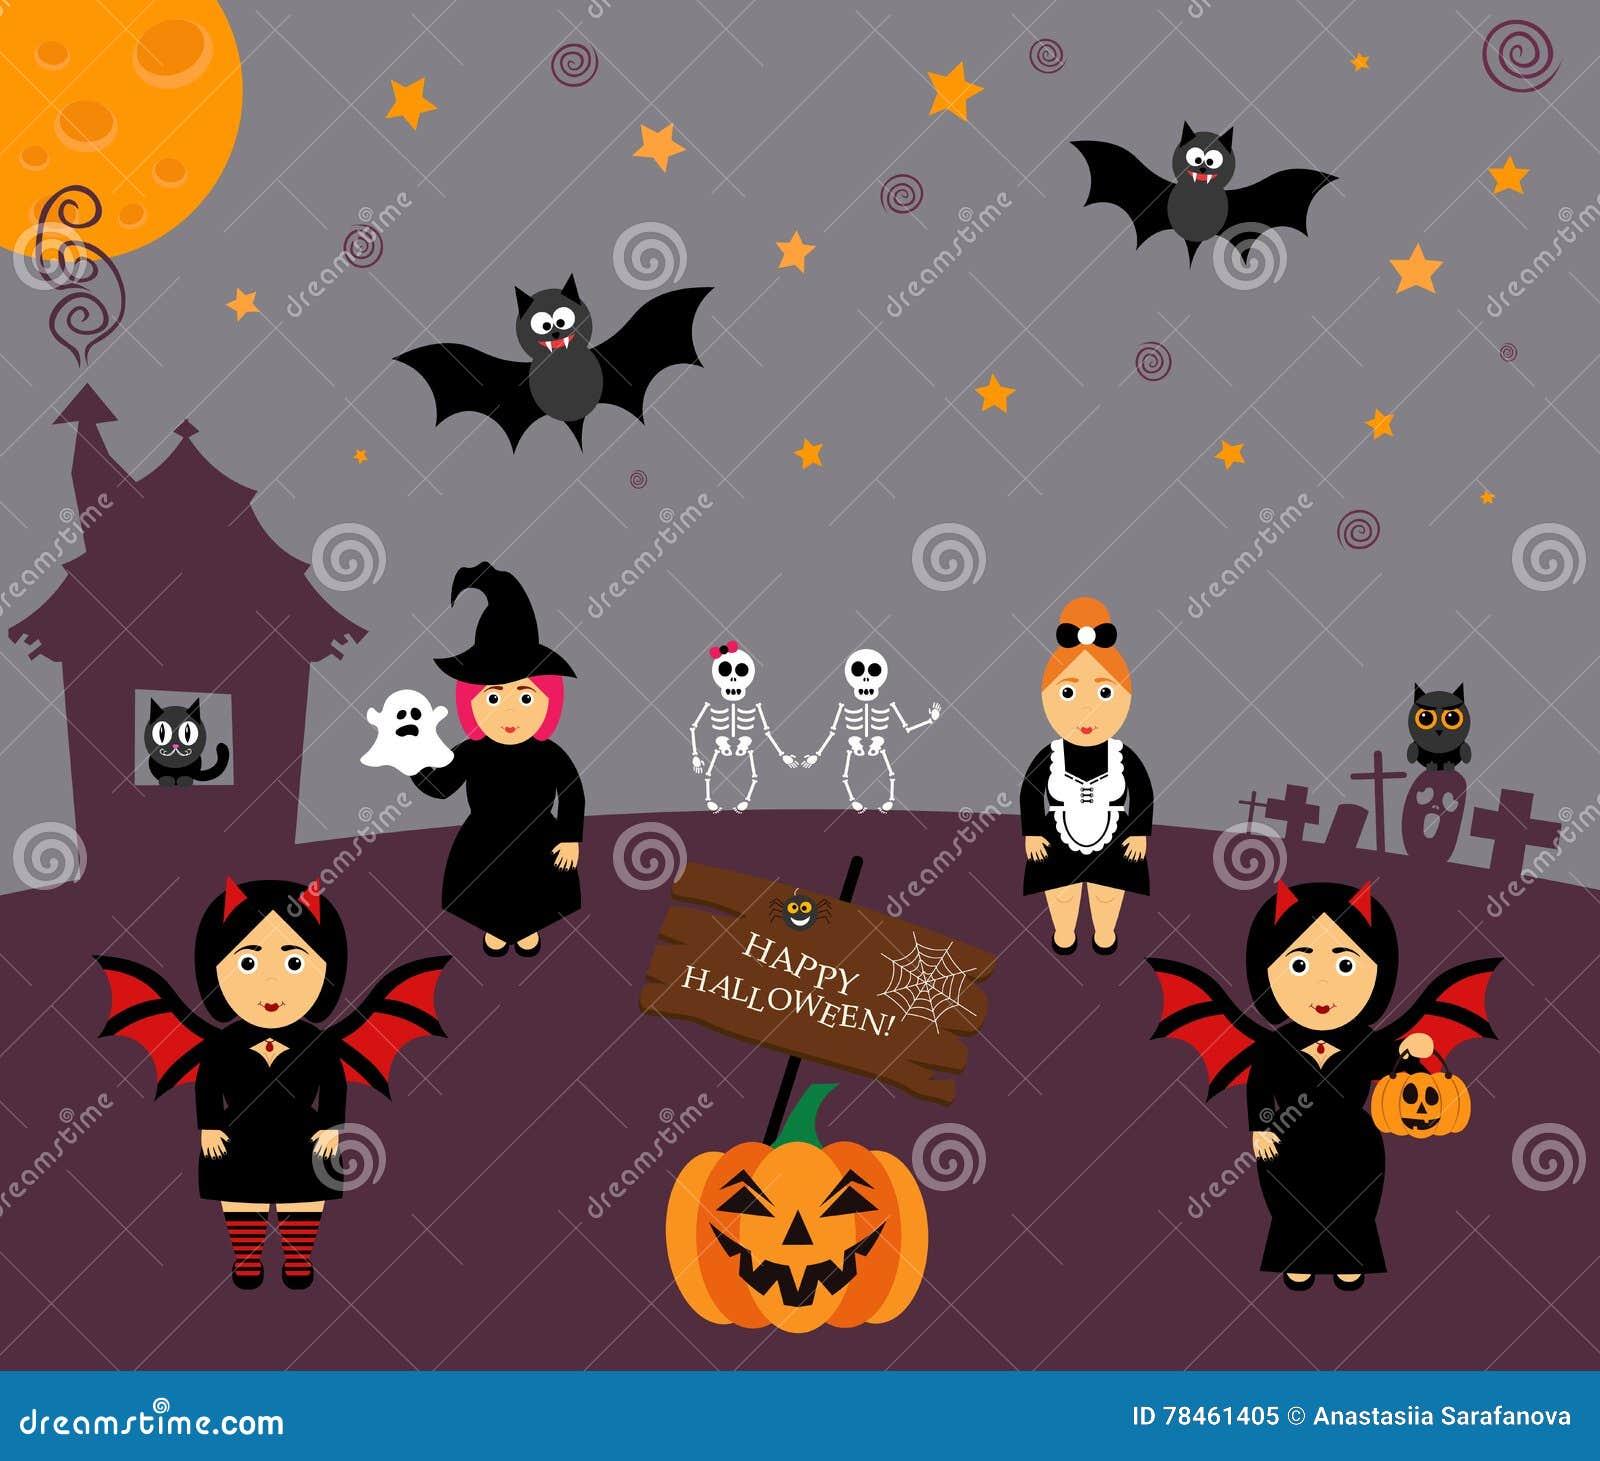 Vector Set For Halloween In Cartoon Style. Pumpkin, Ghost, Owl, Bat ...